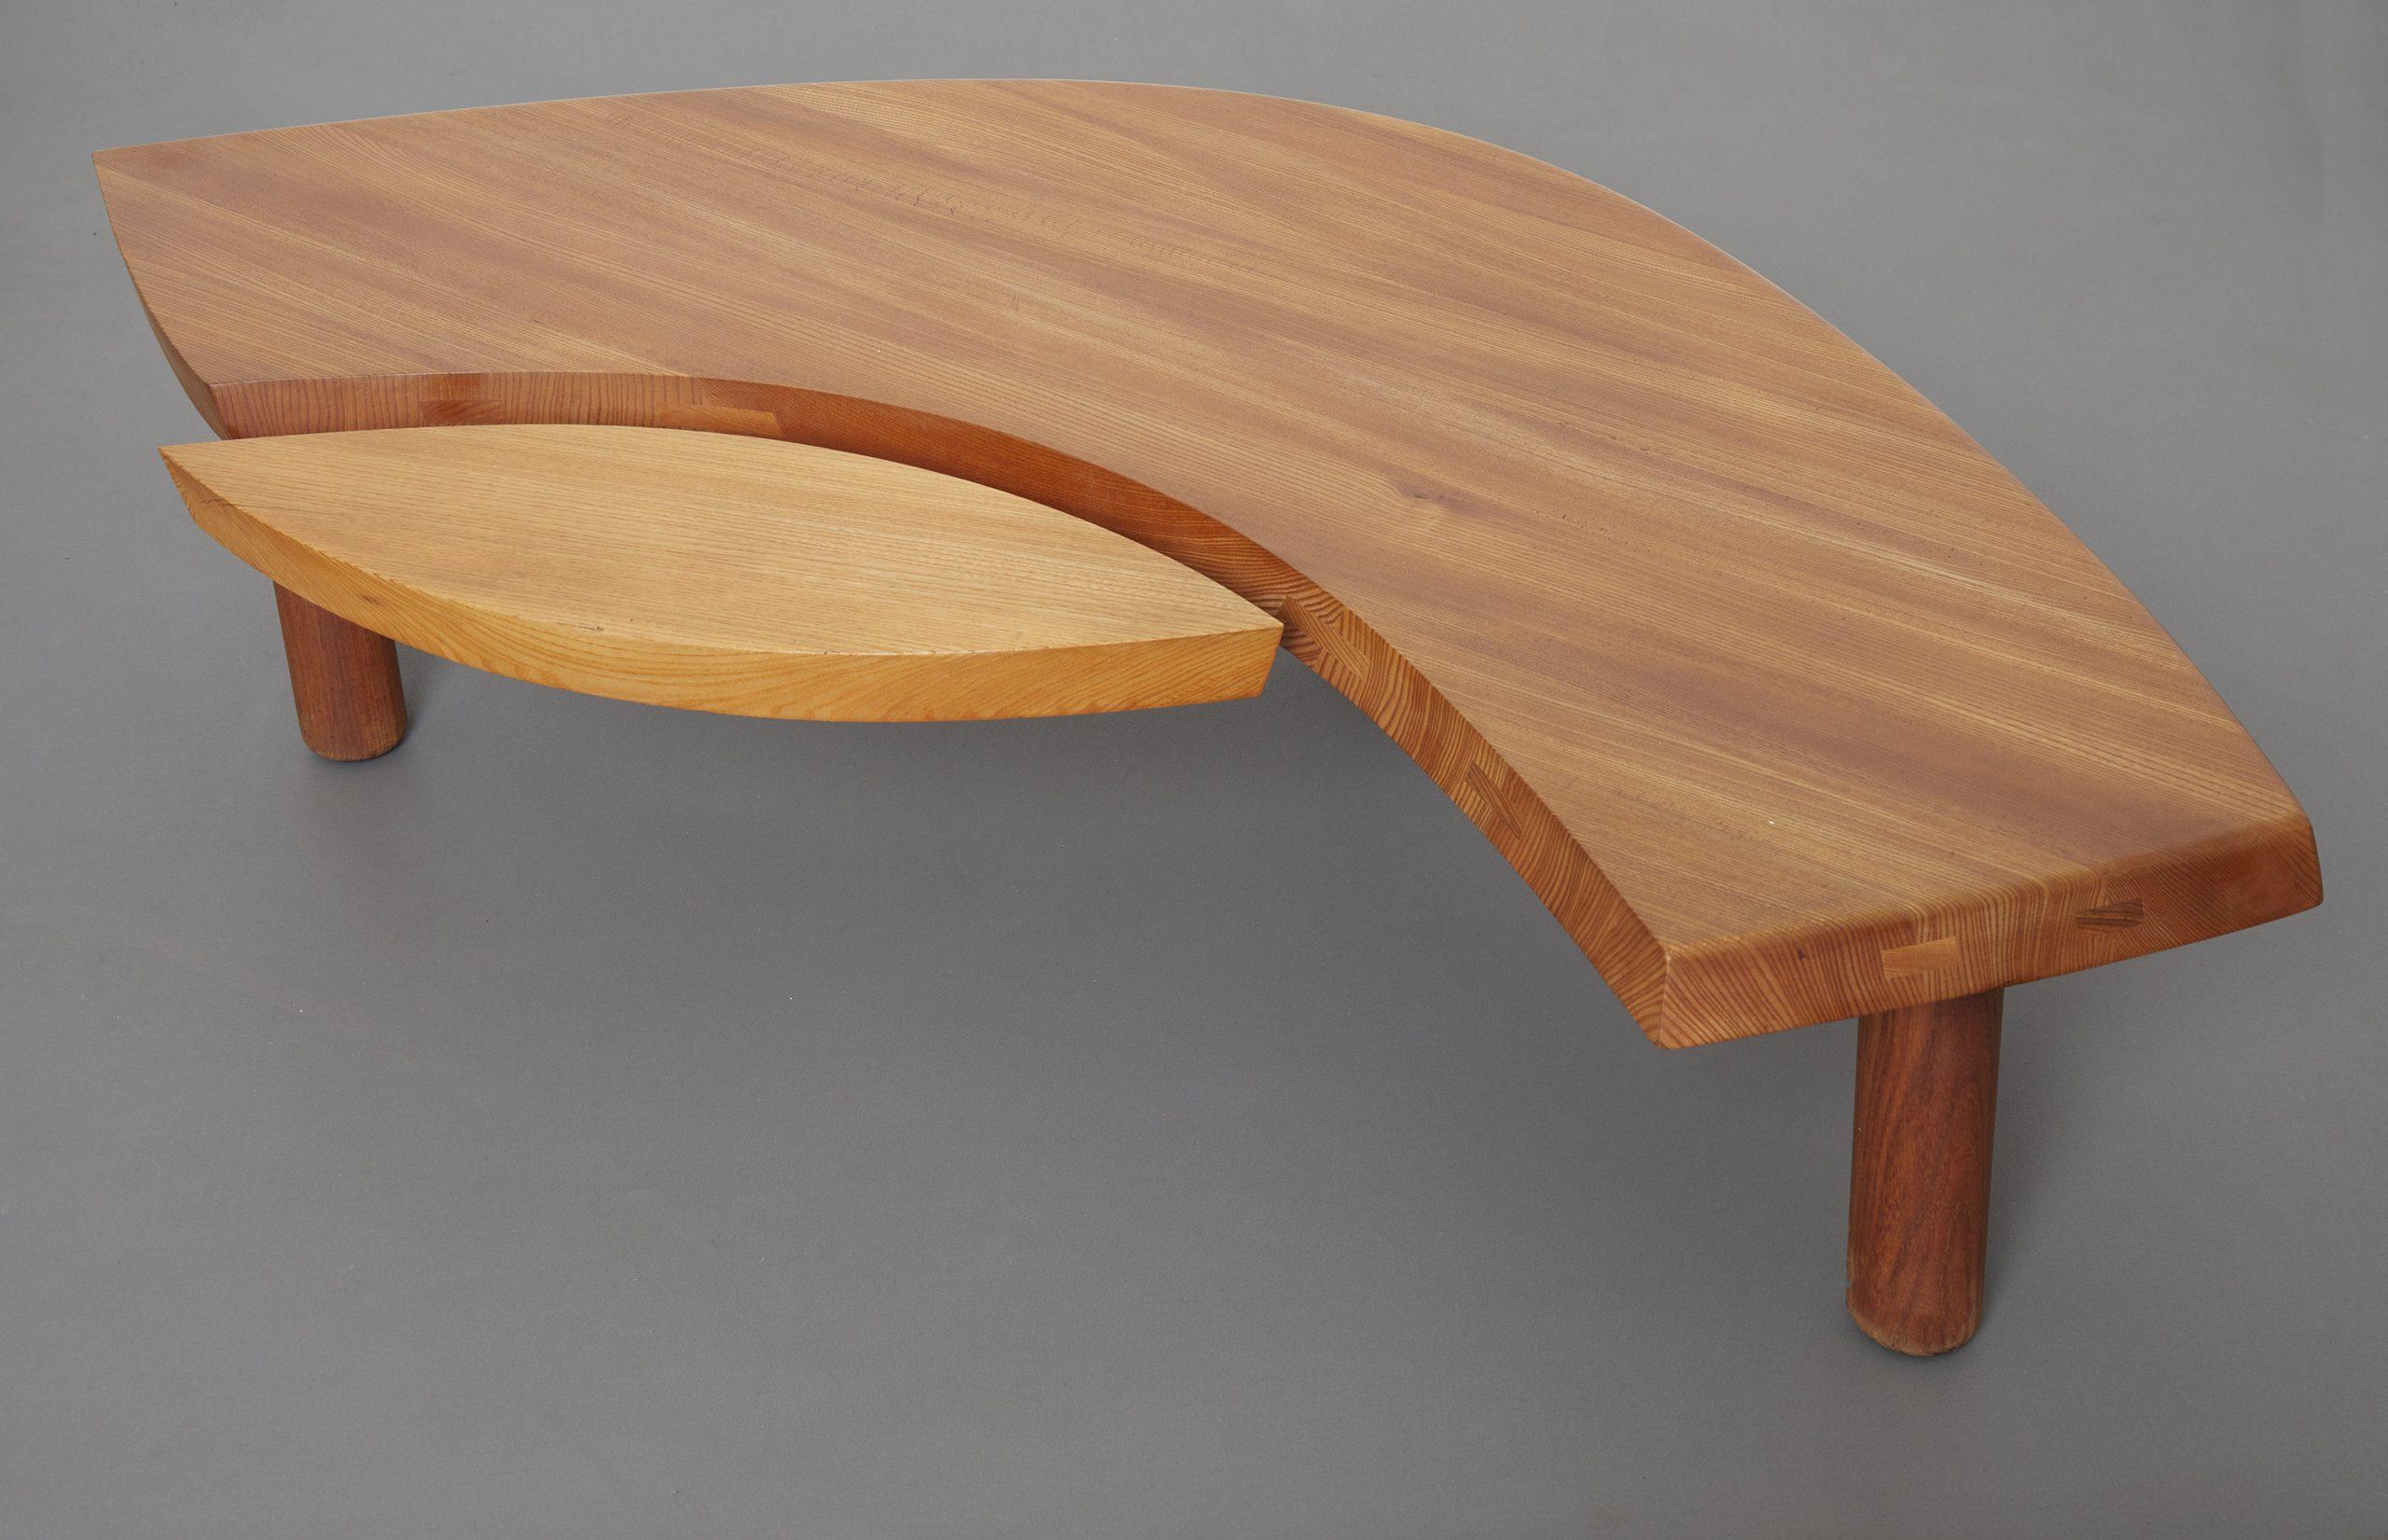 single-elmwood-low-table-t22-by-pierre-chapo-image-03